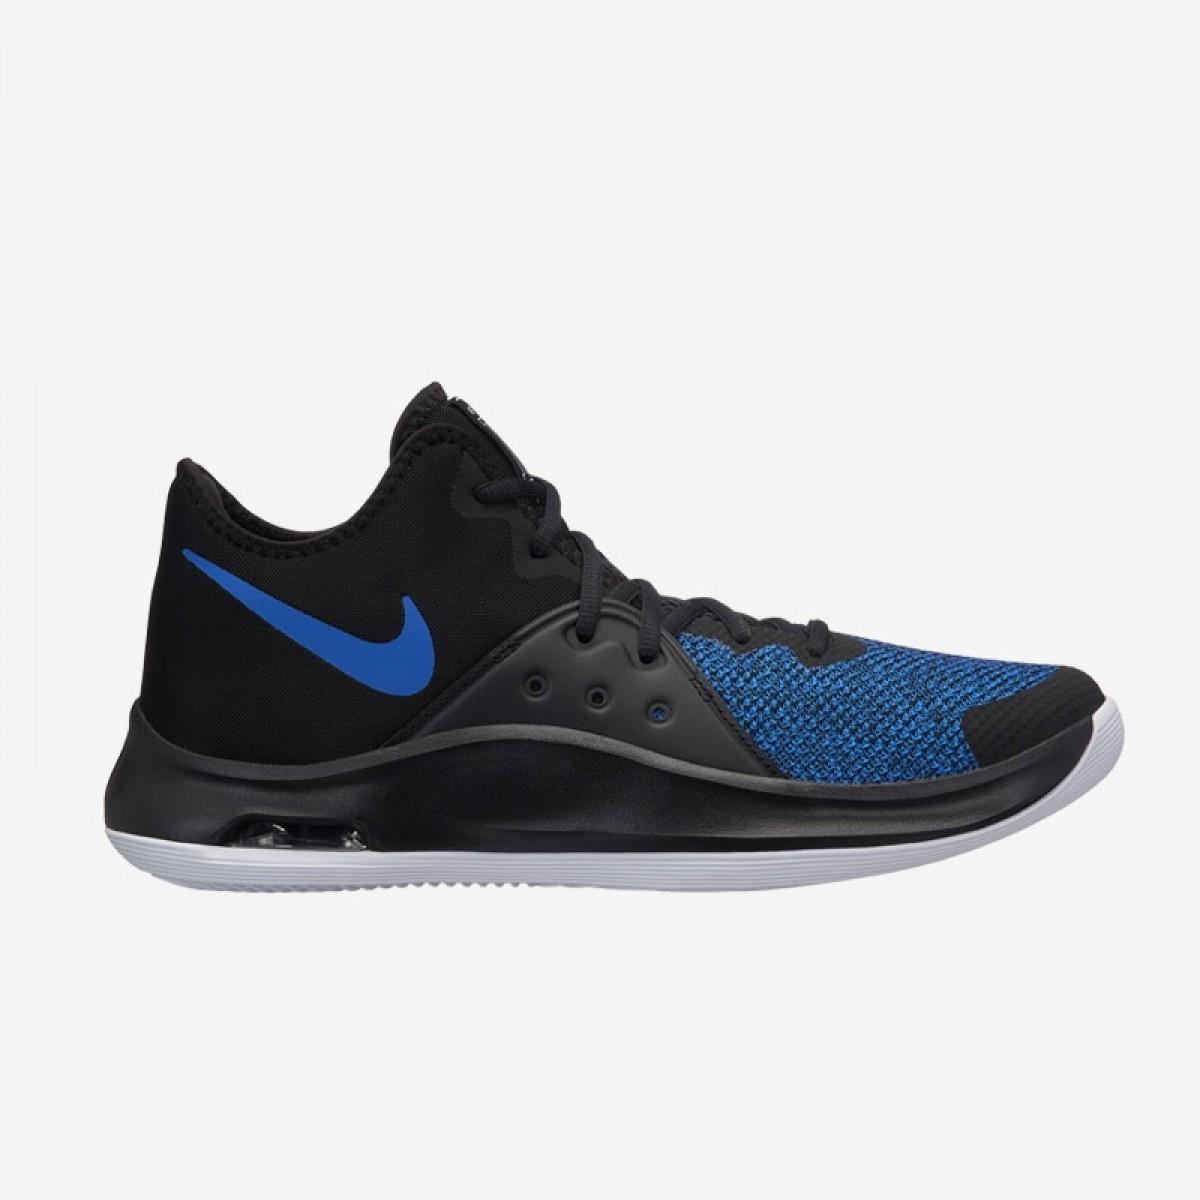 Nike Air Versitile III 'Dark Royal'